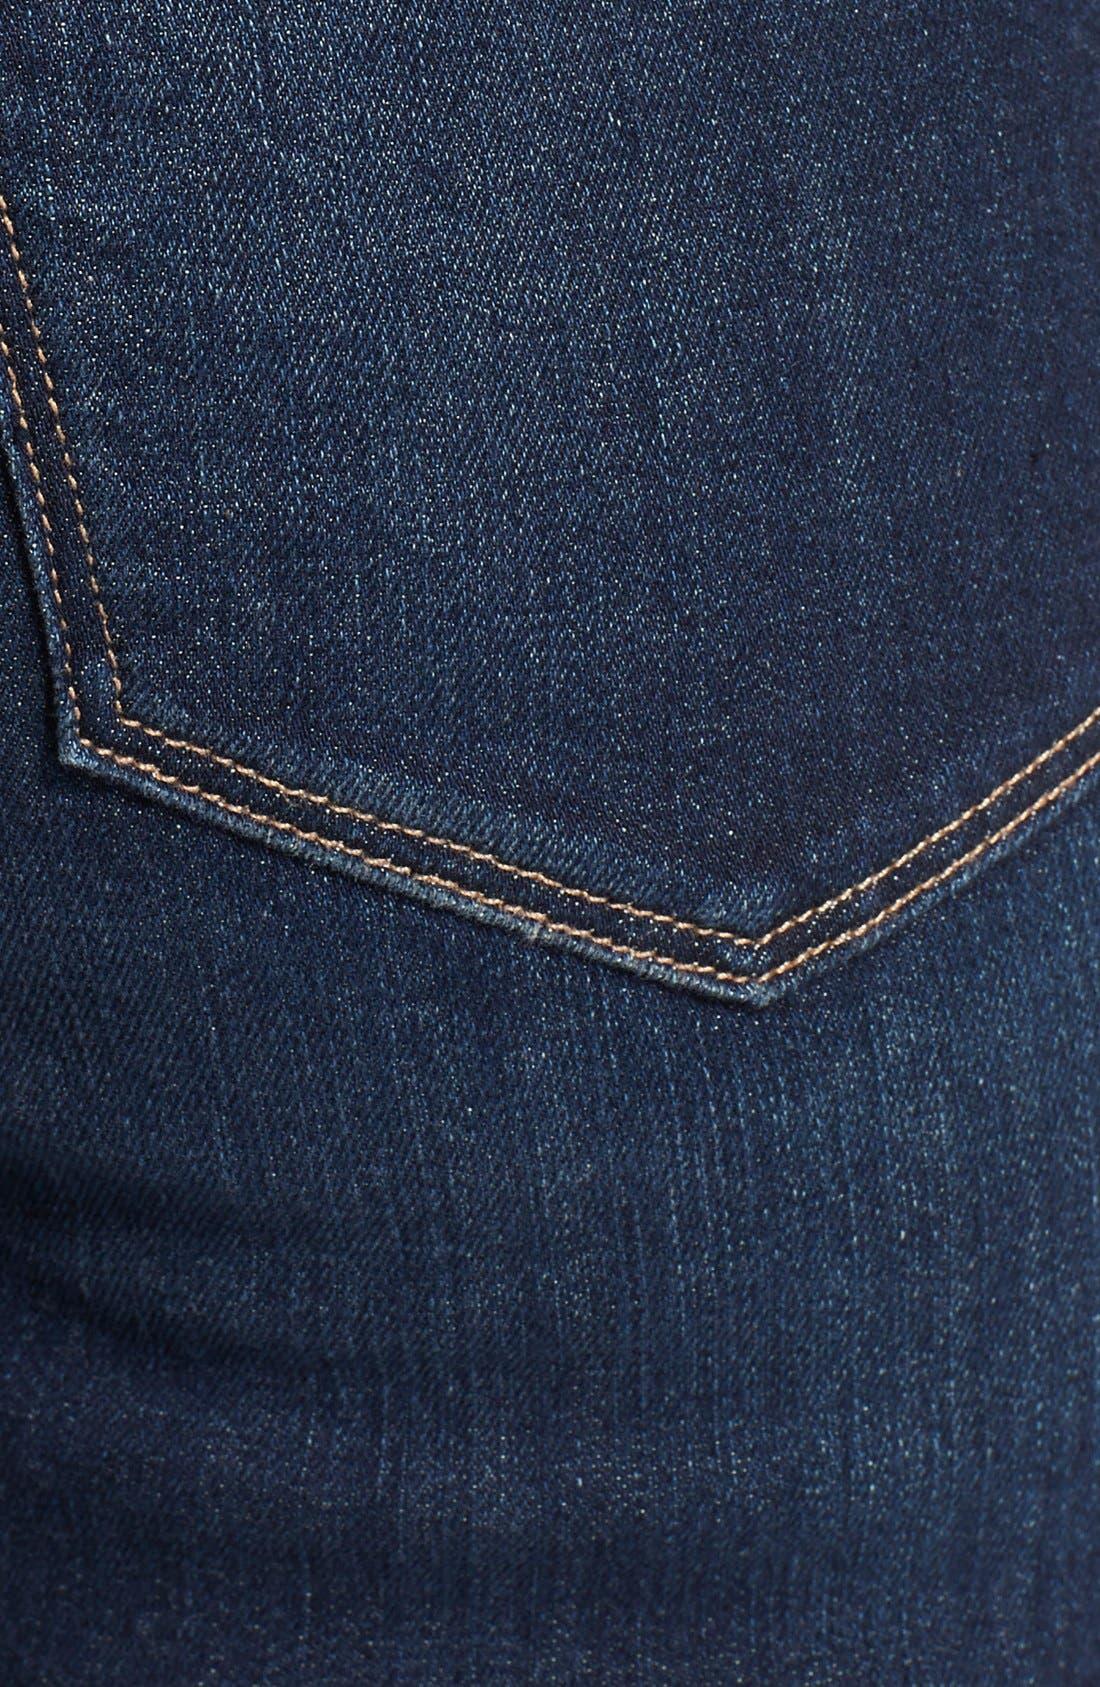 Alternate Image 3  - Frame Denim 'Le High Skinny' Jeans (Altair)